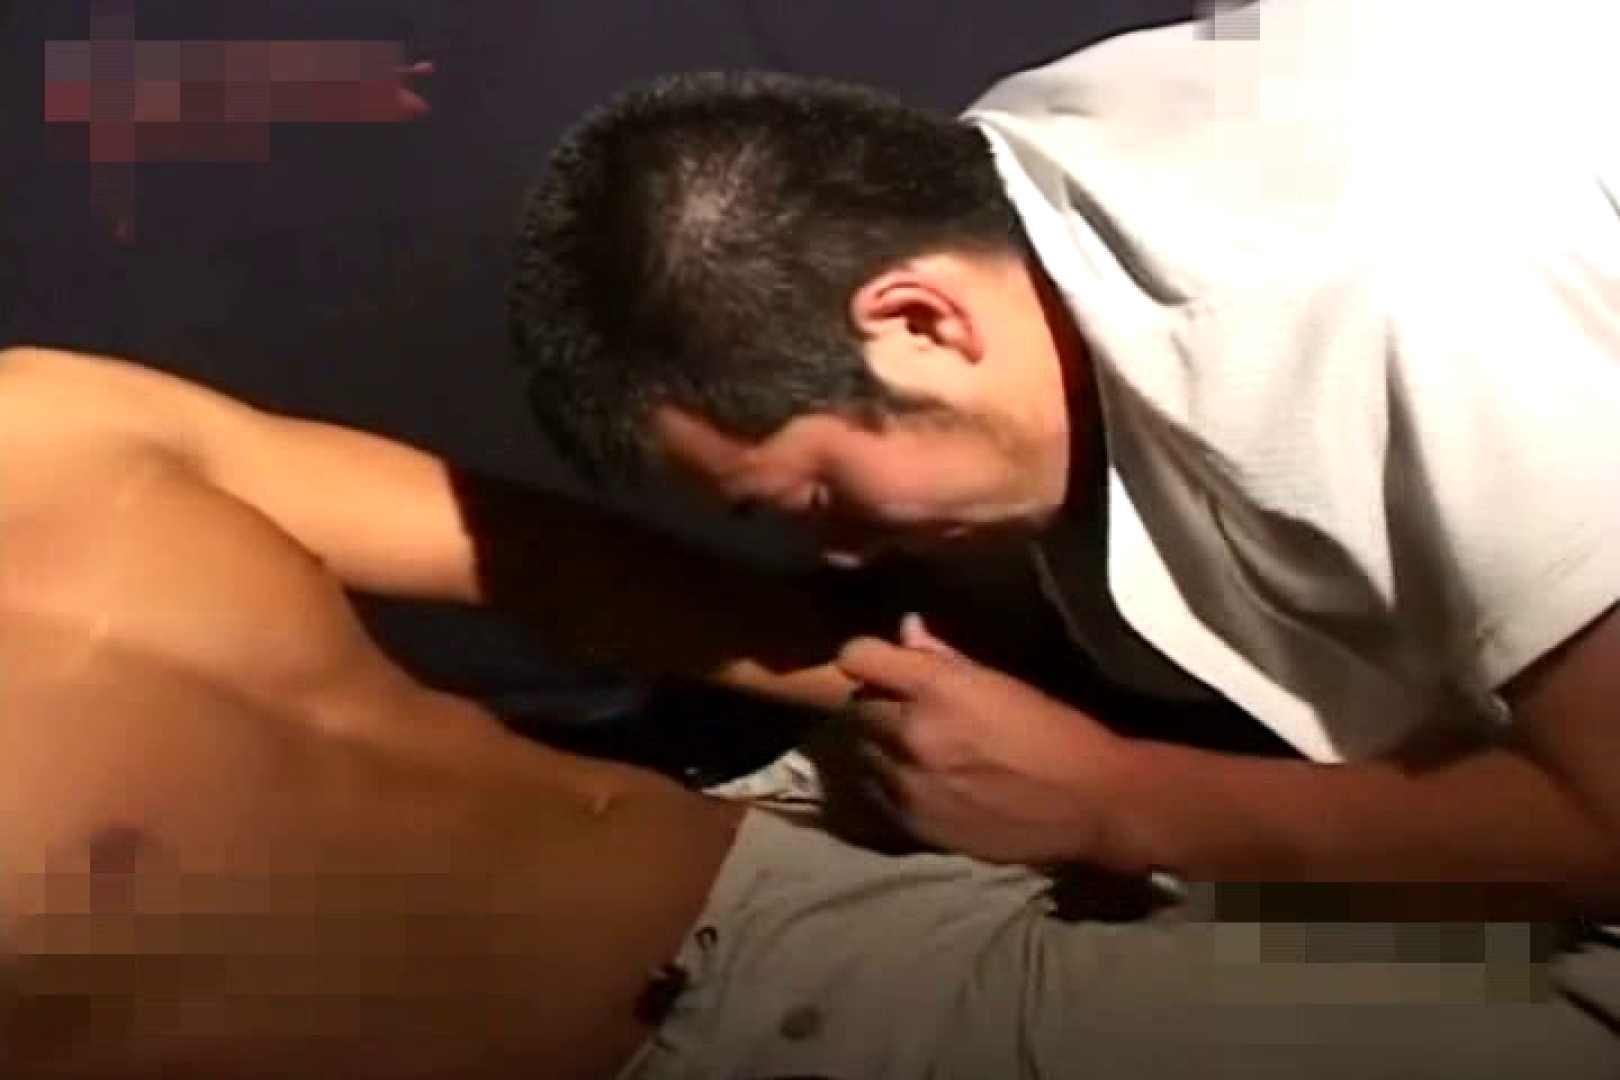 Beautiful muscle モッコリ野郎達!Vol.05 スポーツ系ボーイズ | 菊指  101pic 90